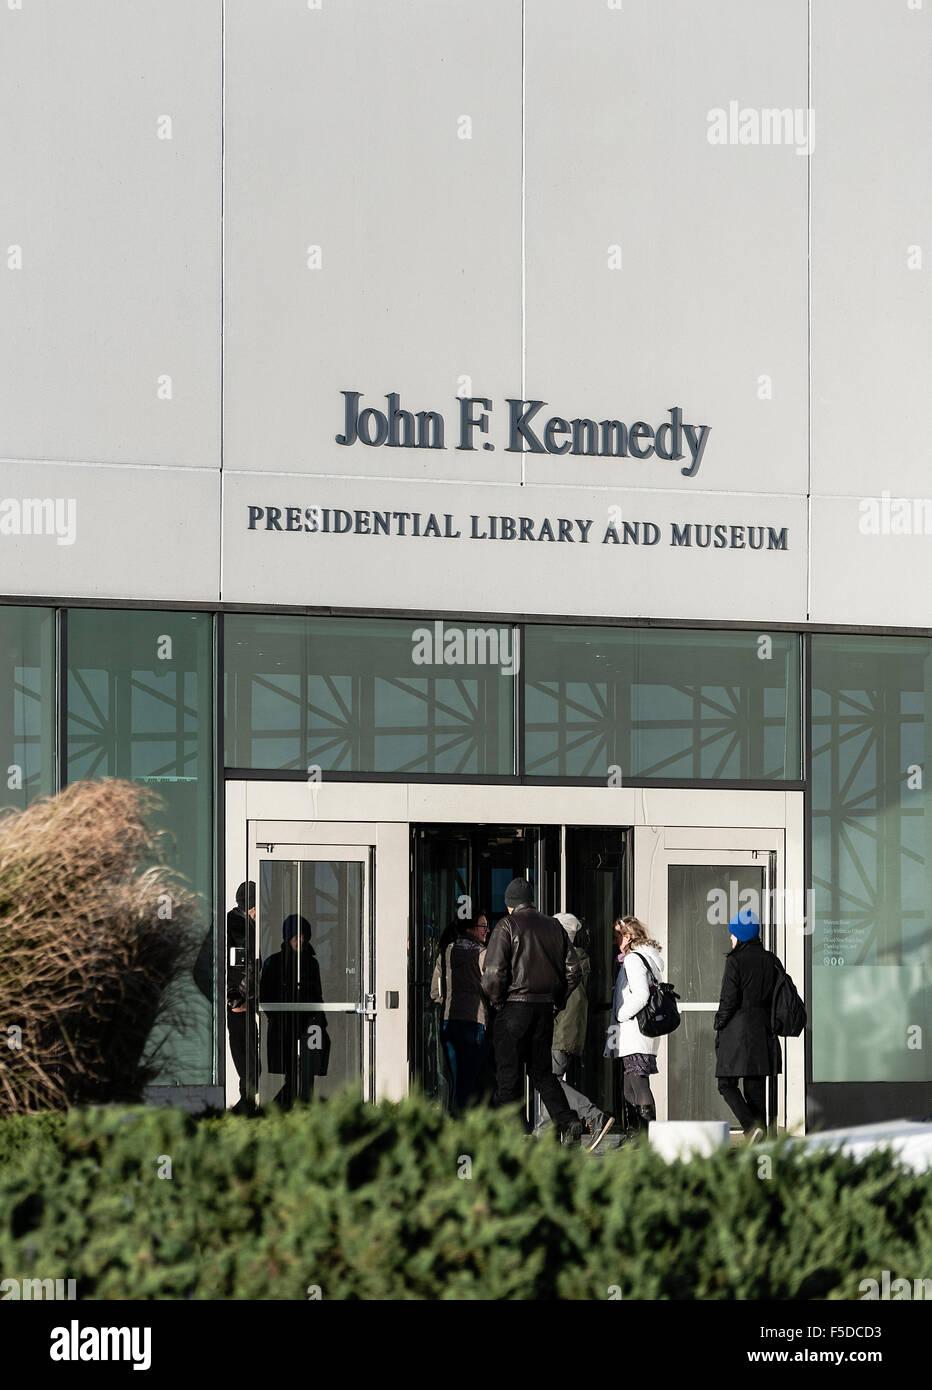 John F. Kennedy Presidential Library and Museum, Boston, Massachusetts, EE.UU. Imagen De Stock